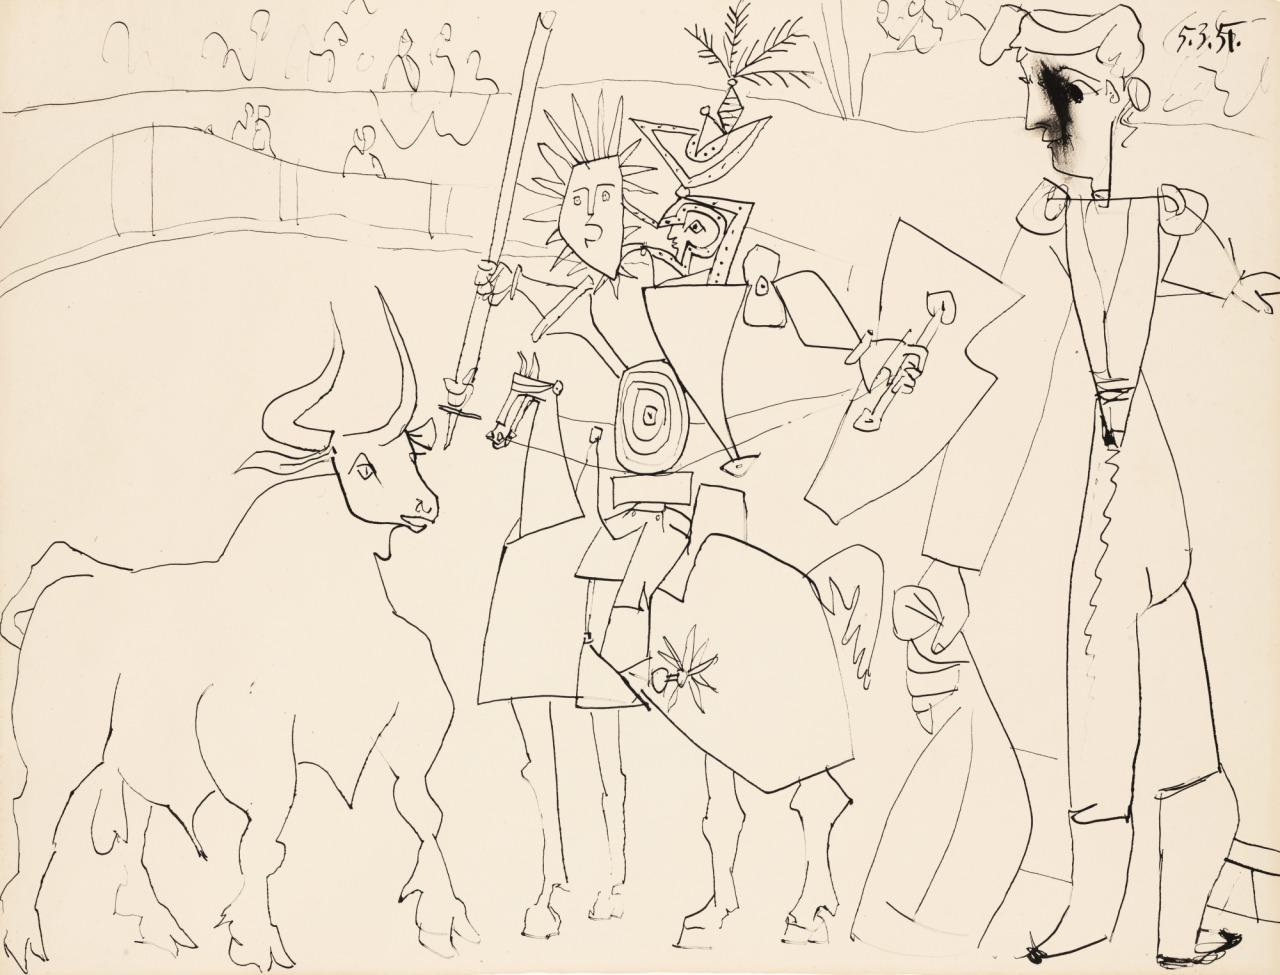 thunderstruck9:  Pablo Picasso (Spanish, 1881-1973), Chevalier et picador dans l'arène, 5th March 1951. Pen and ink on paper, 50.7 x 65.8 cm.